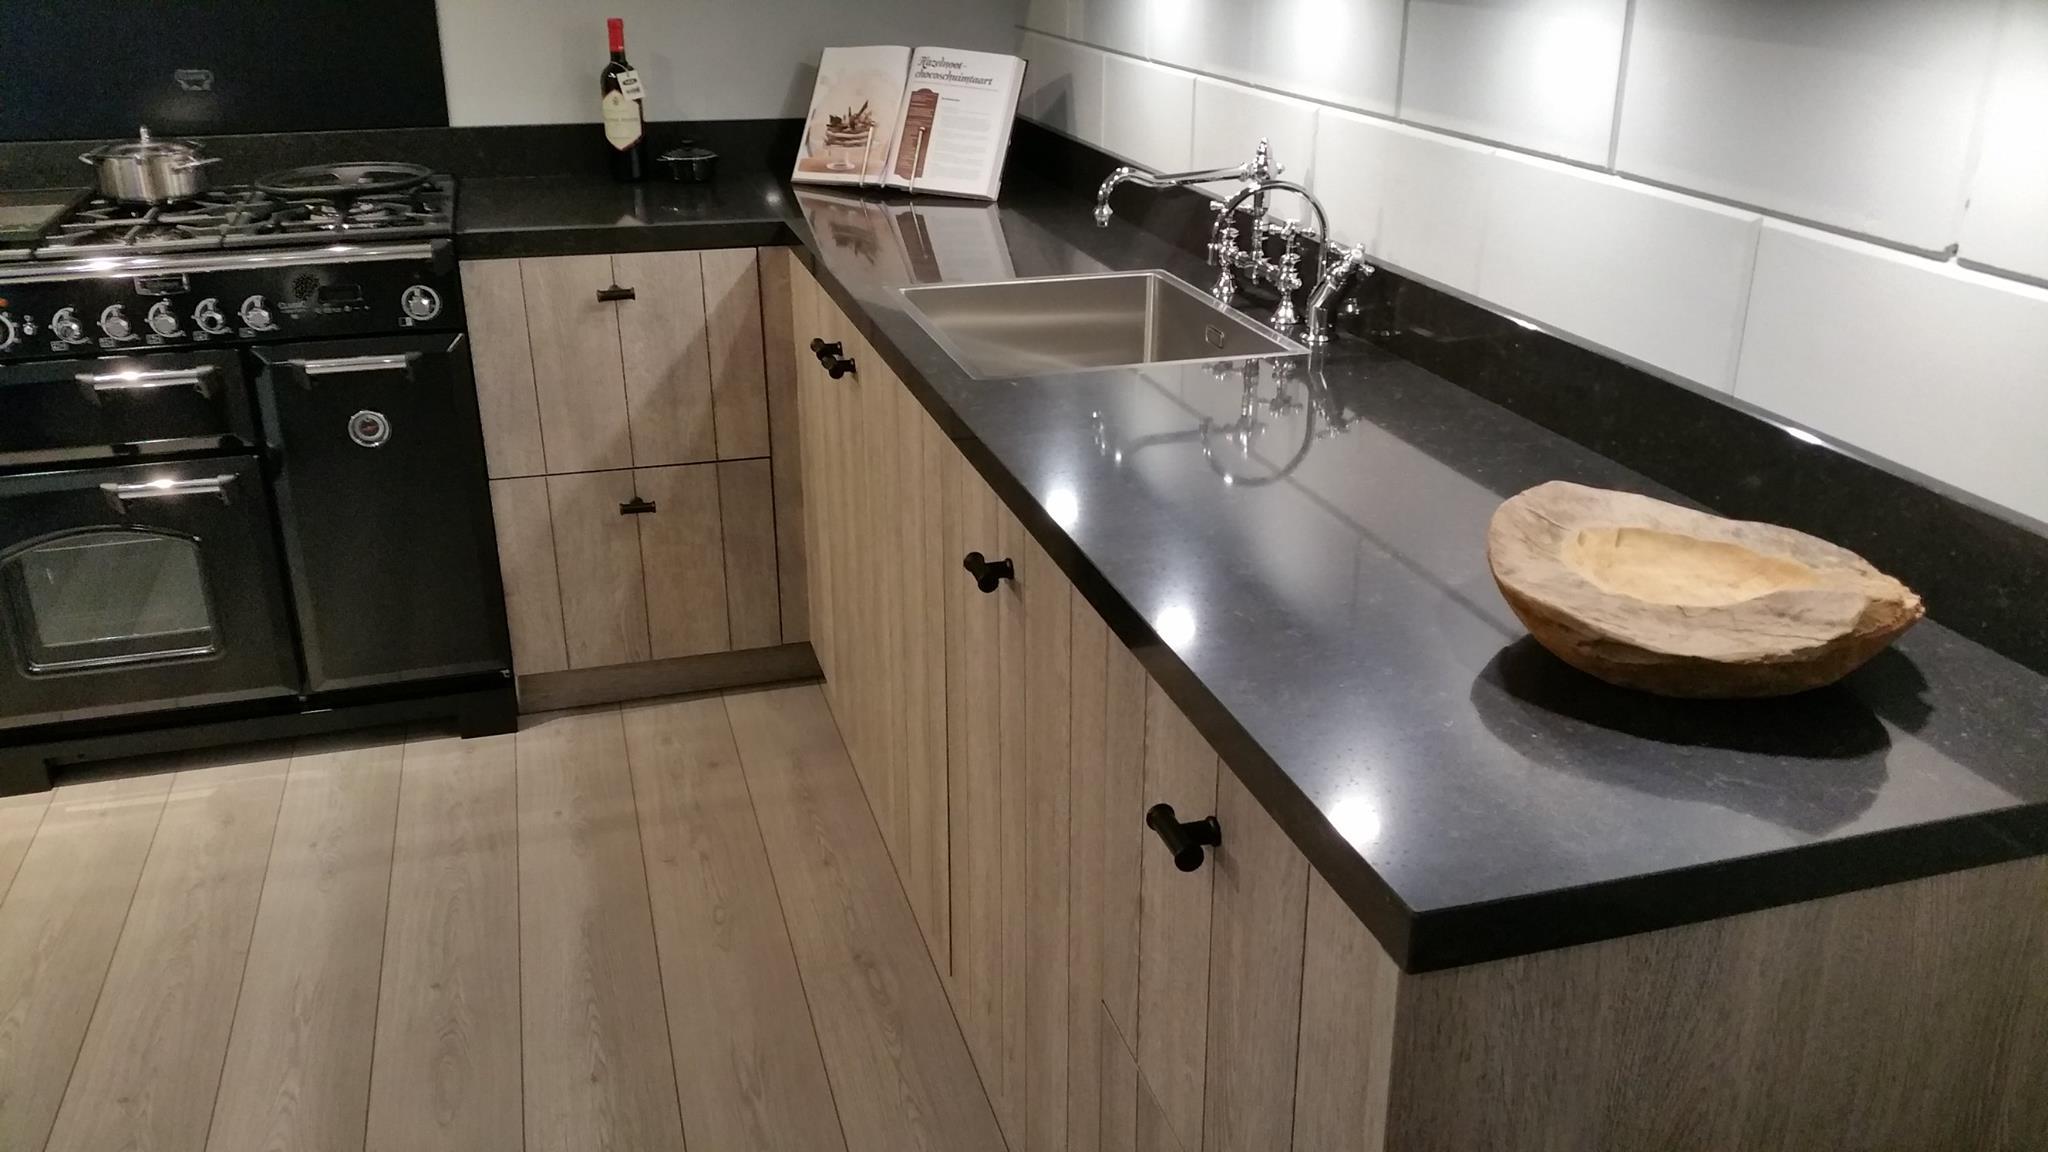 Kroonkeukens leverancier van kwaliteitskeukens in noord holland koks kiezen kroonkeukens - Nieuwe keuken ...